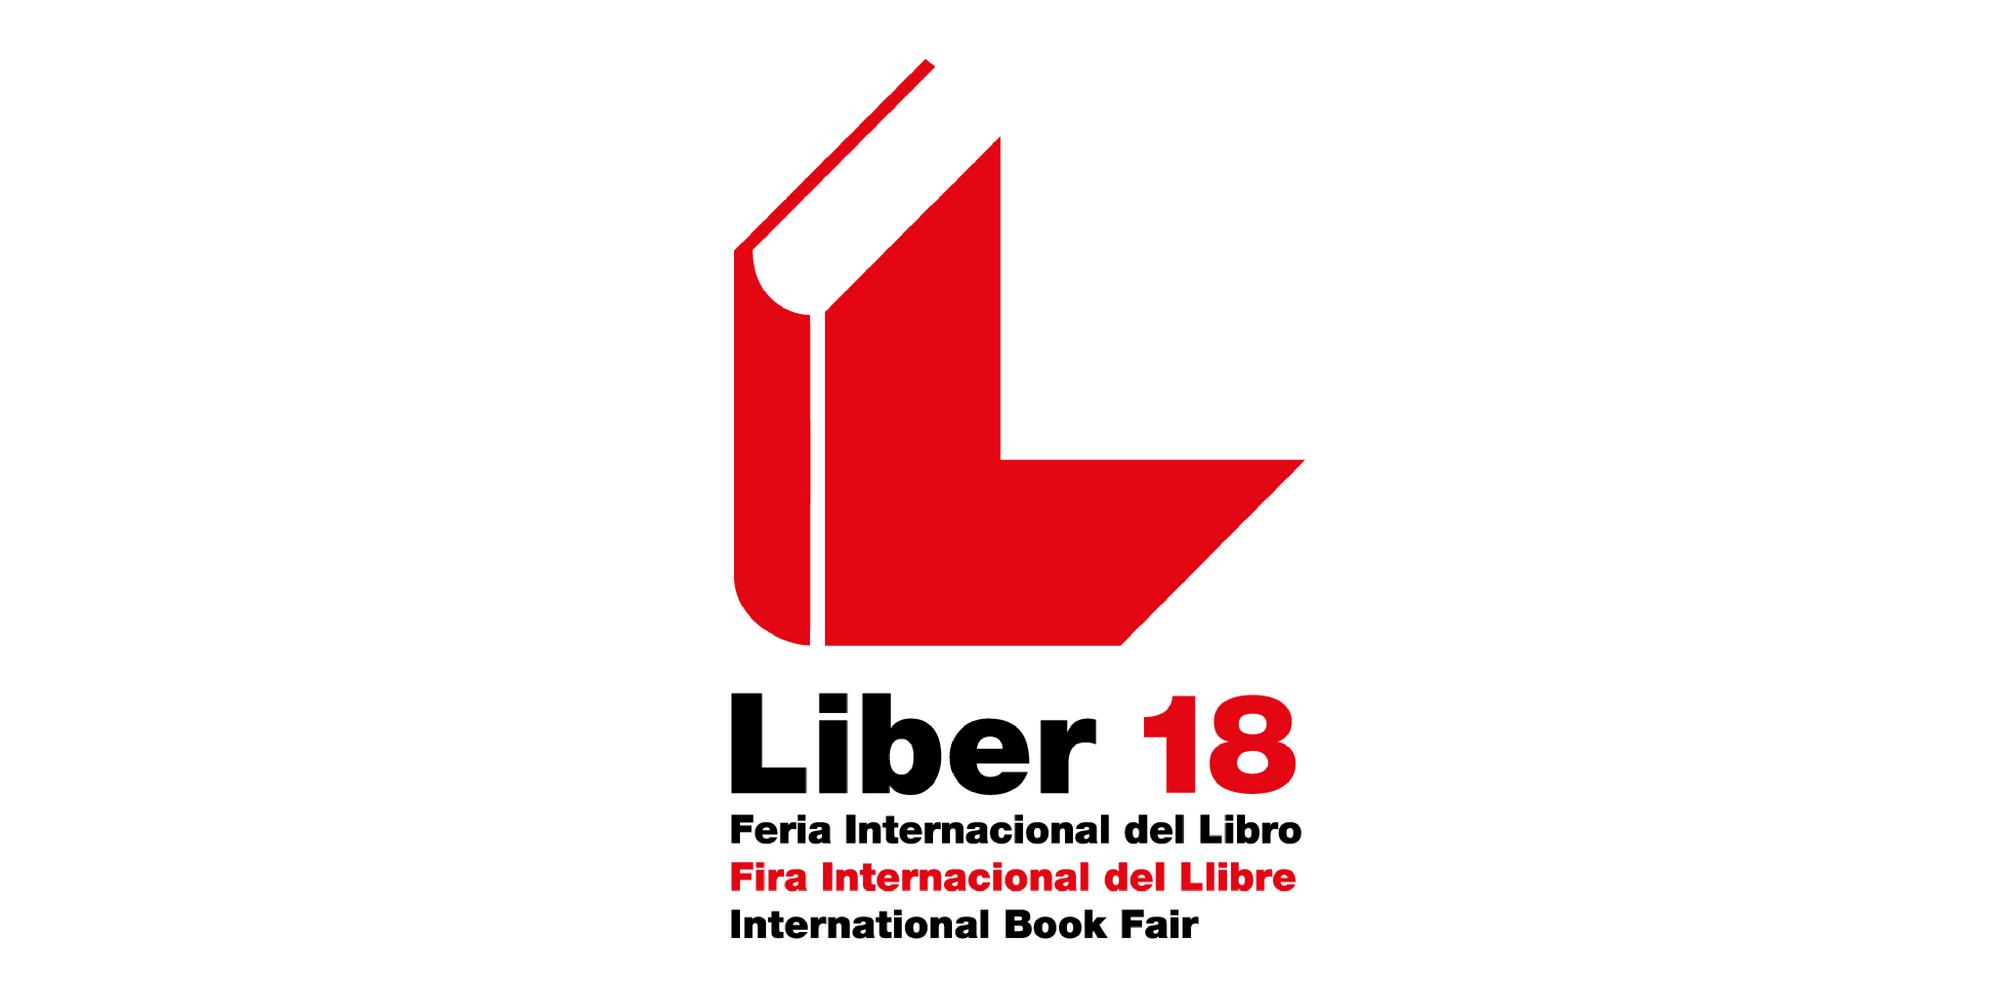 Sesión informativa en Liber 2018, Feria Internacional del Libro. Barcelona